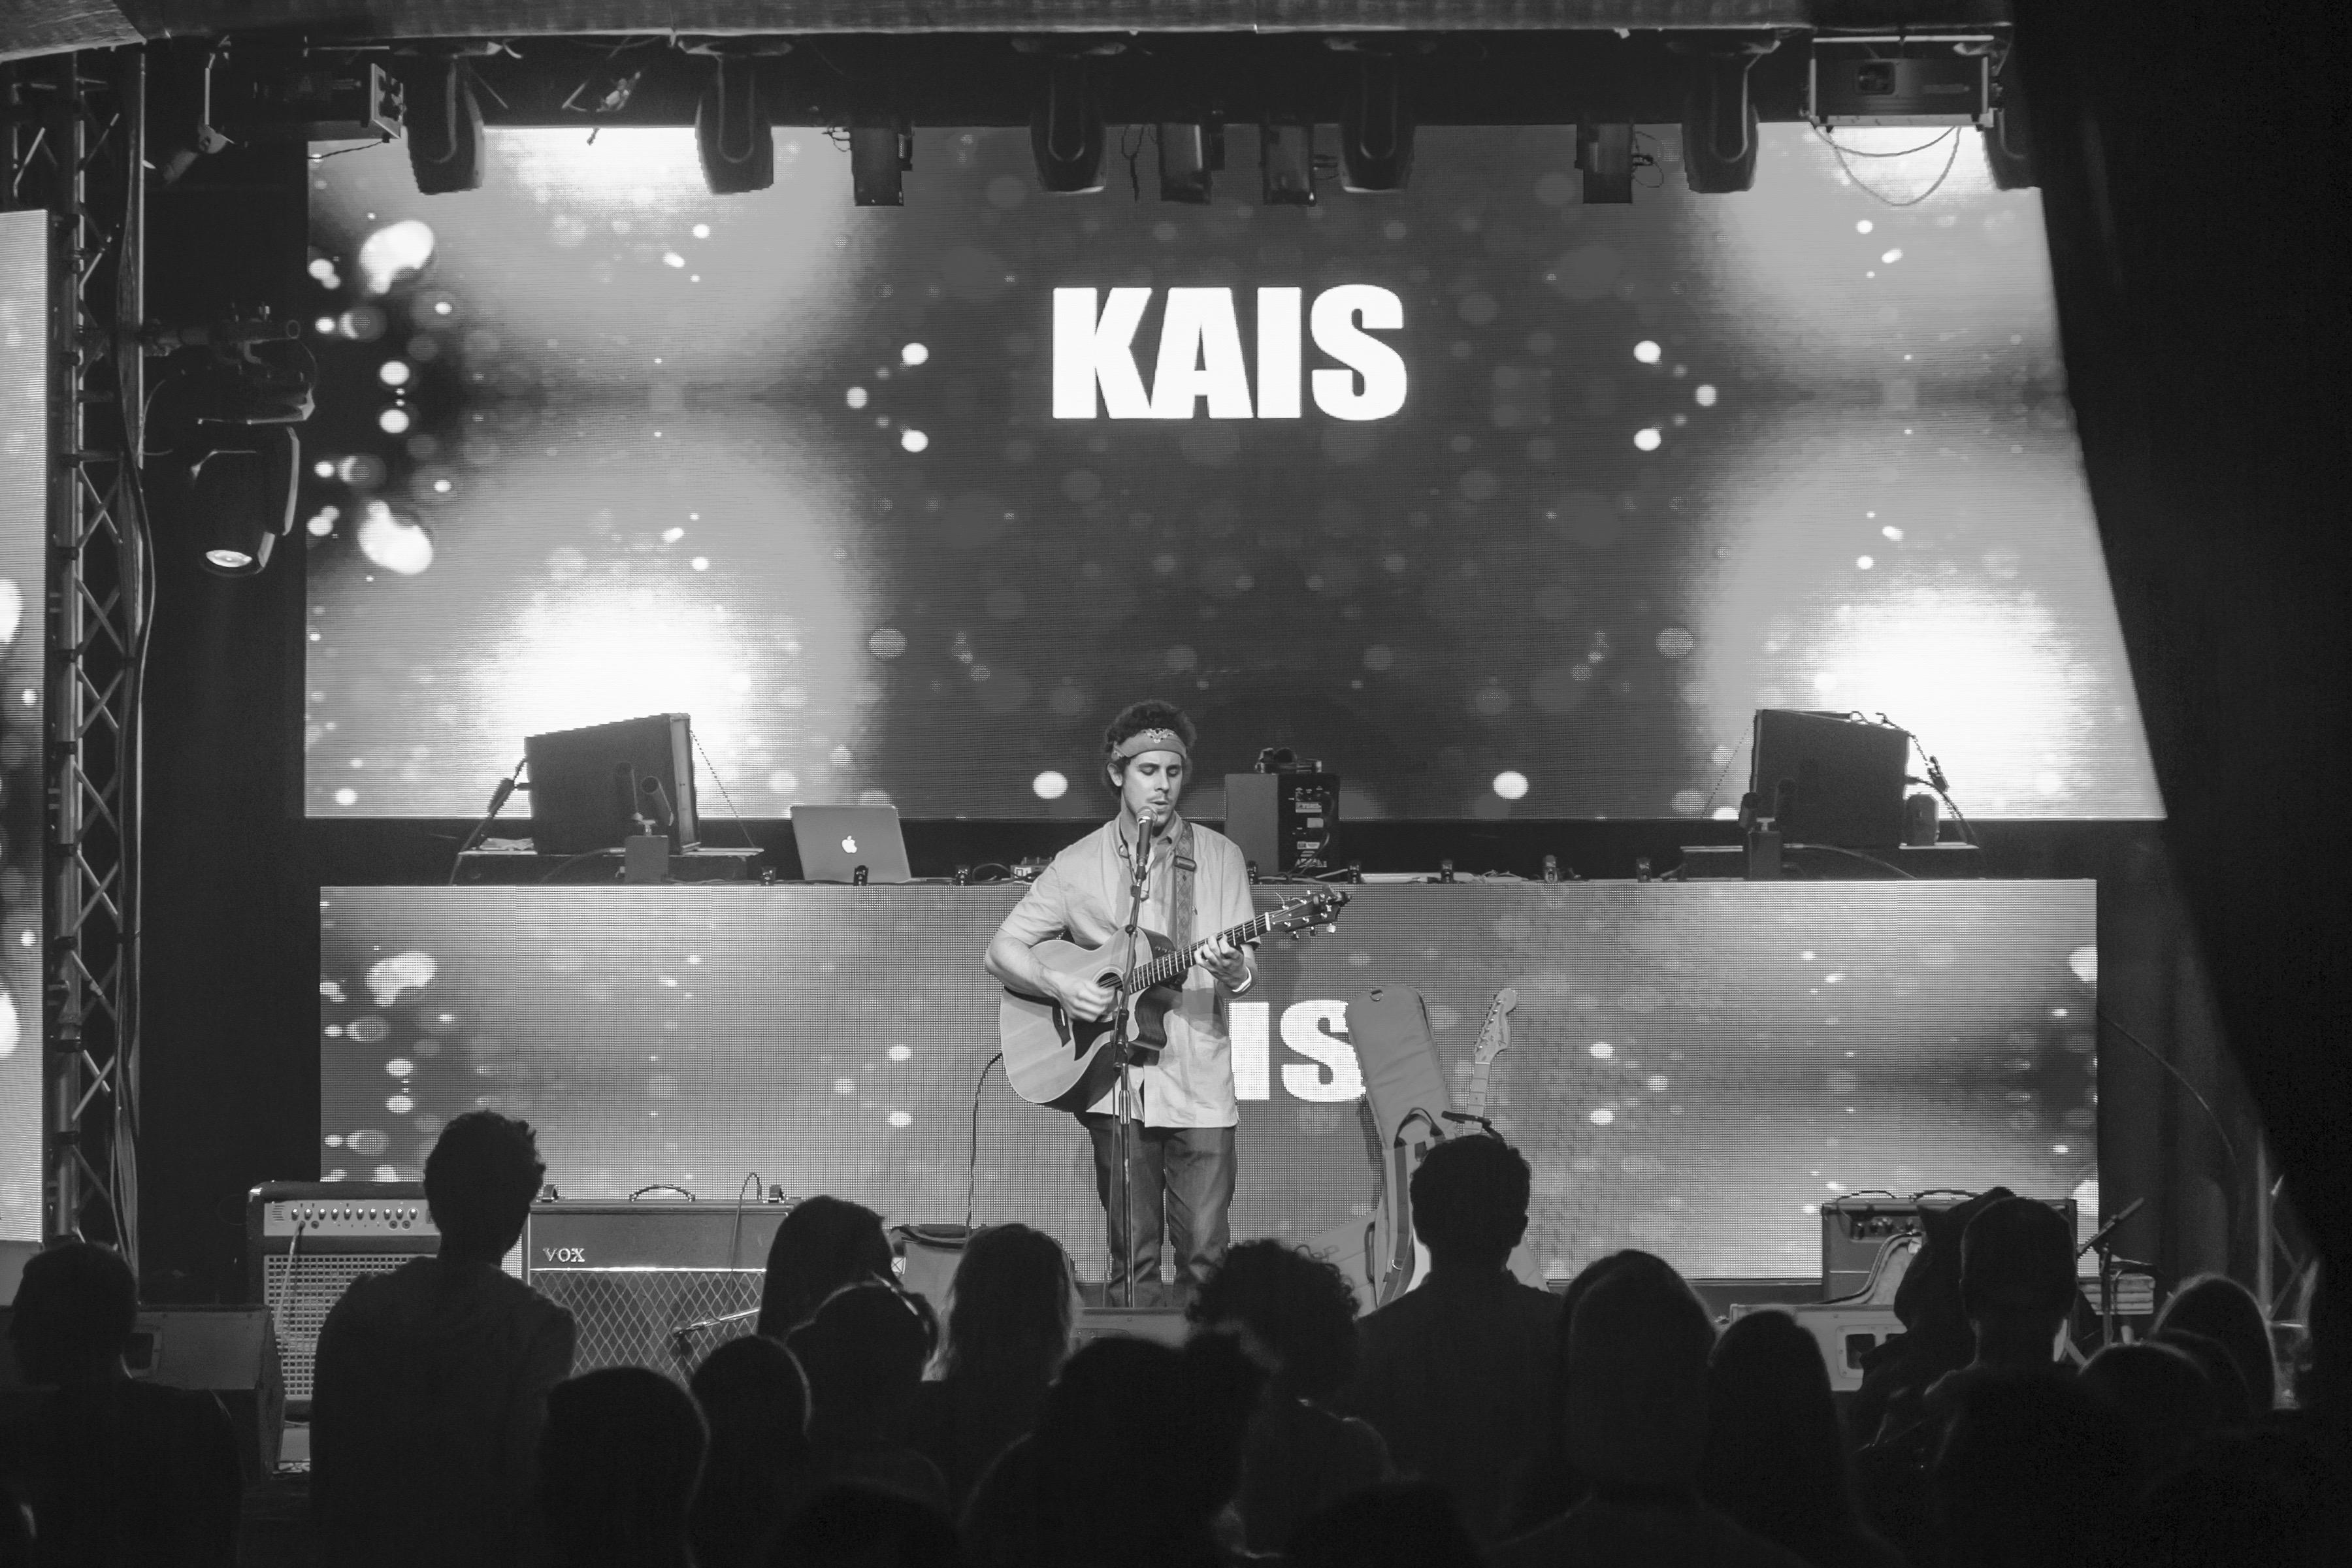 KAIS - Raw Artists - Harbour Events Centre